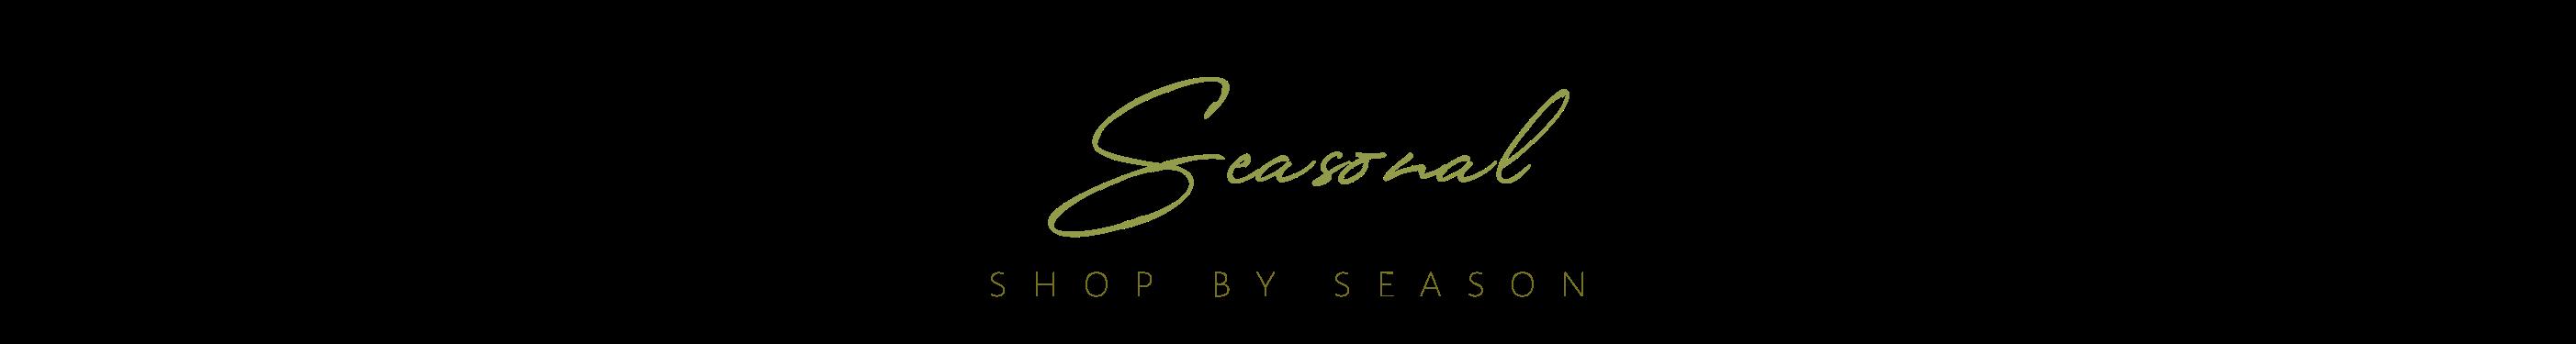 seasonal-banner.png